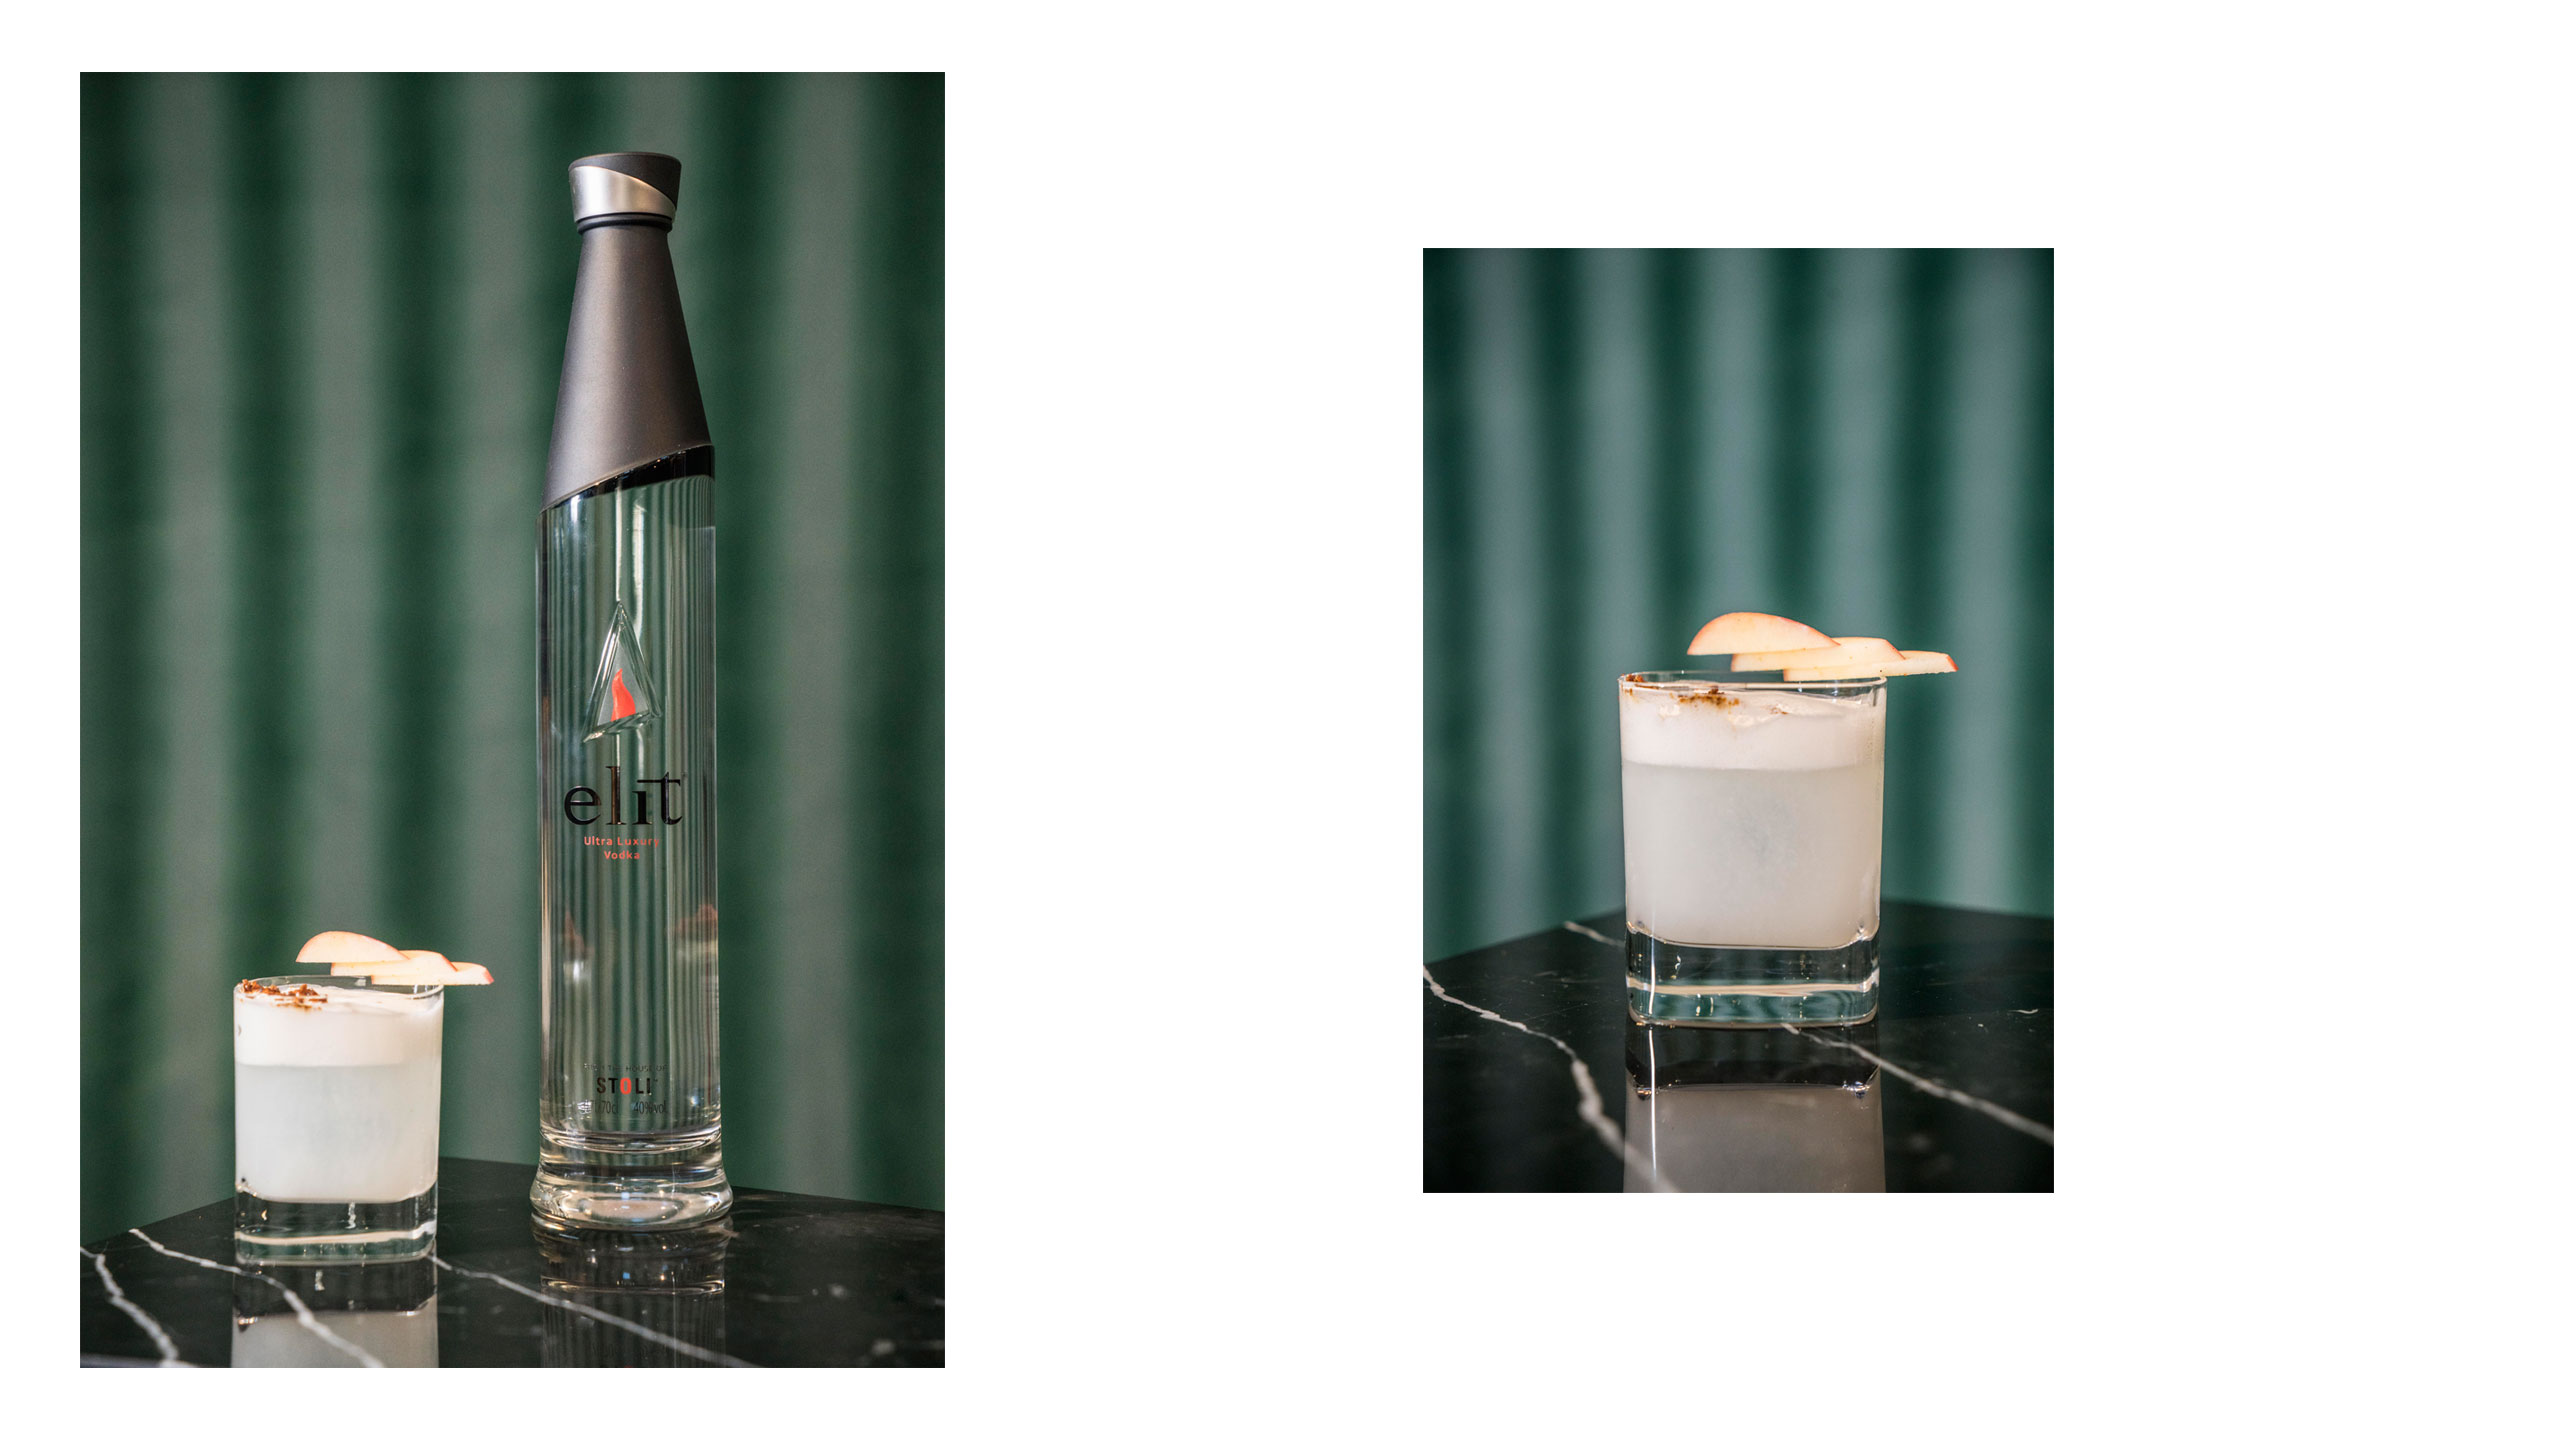 """Object"" by elit® Vodka, inspired by El Lissitzky. Photo© elit® Vodka."